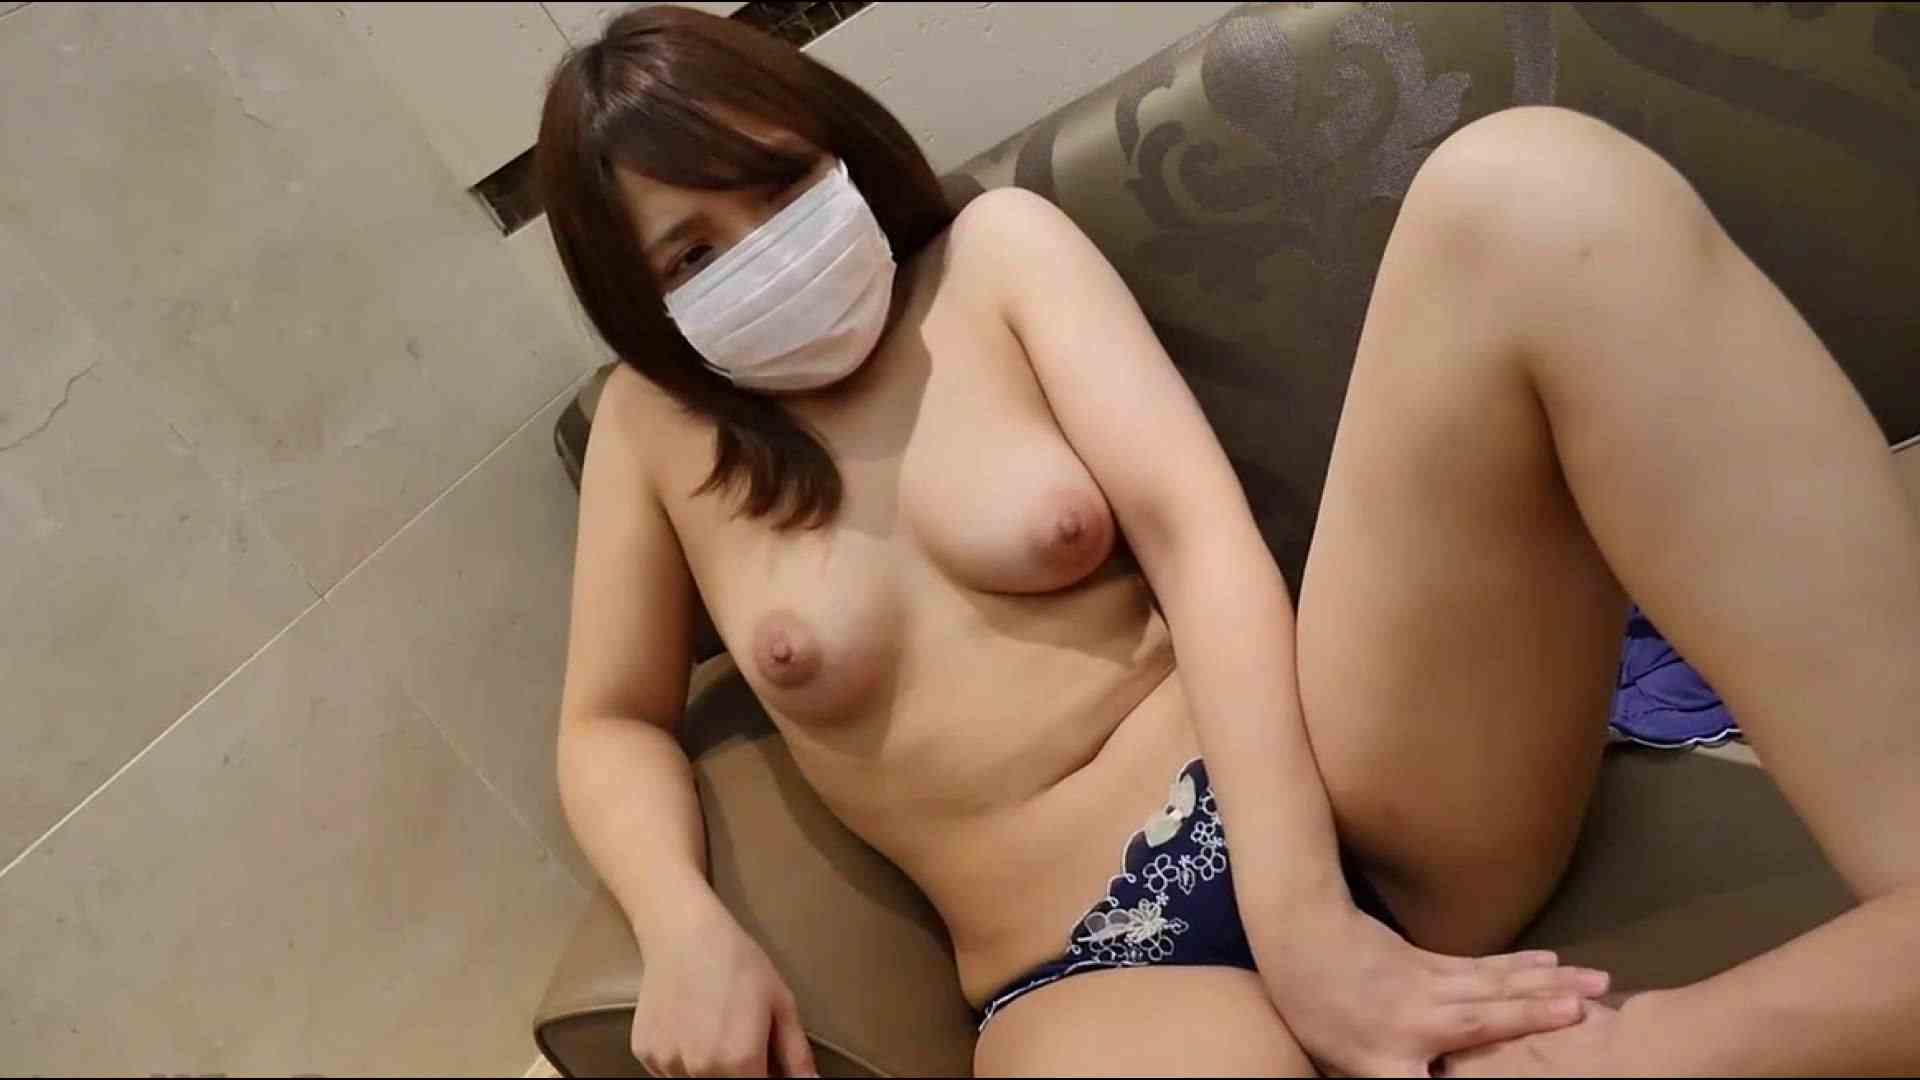 S級厳選美女ビッチガールVol.41 前編 美女 | OLの実態  83pic 65